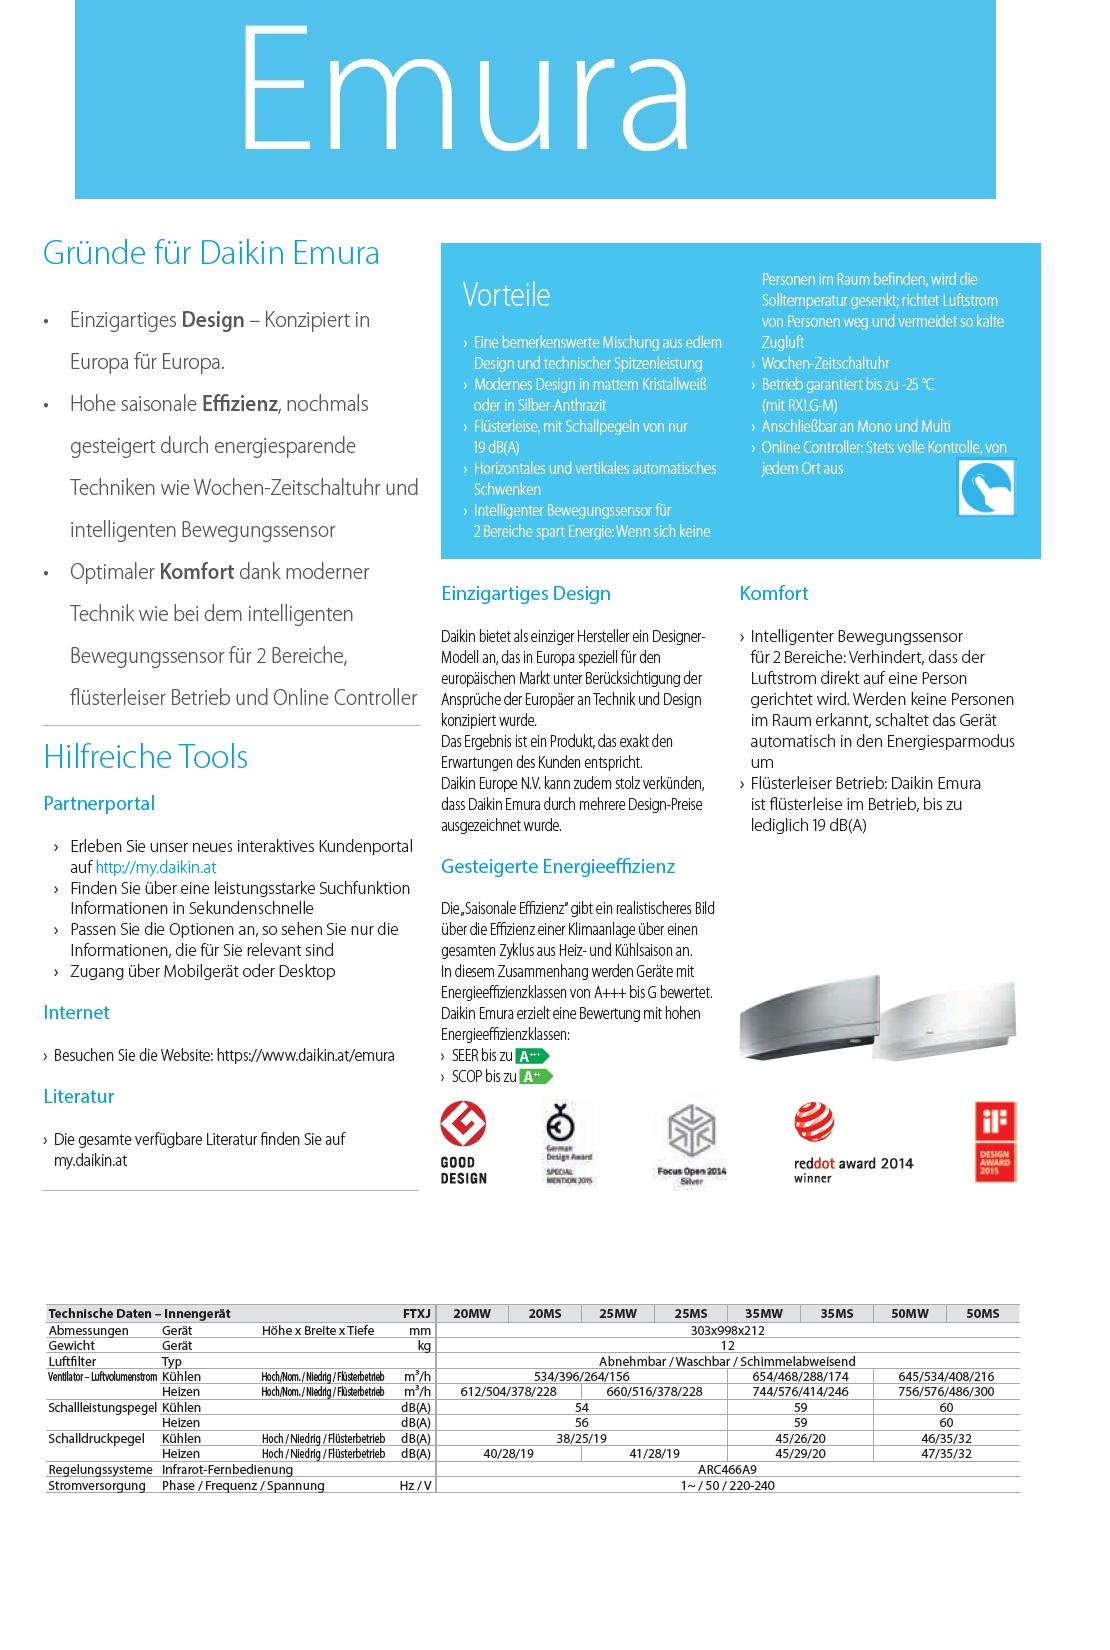 Klimaanlagen Daikin Duo Split 7000+12000 Btu Emura FTXJ-MW A+++/A++